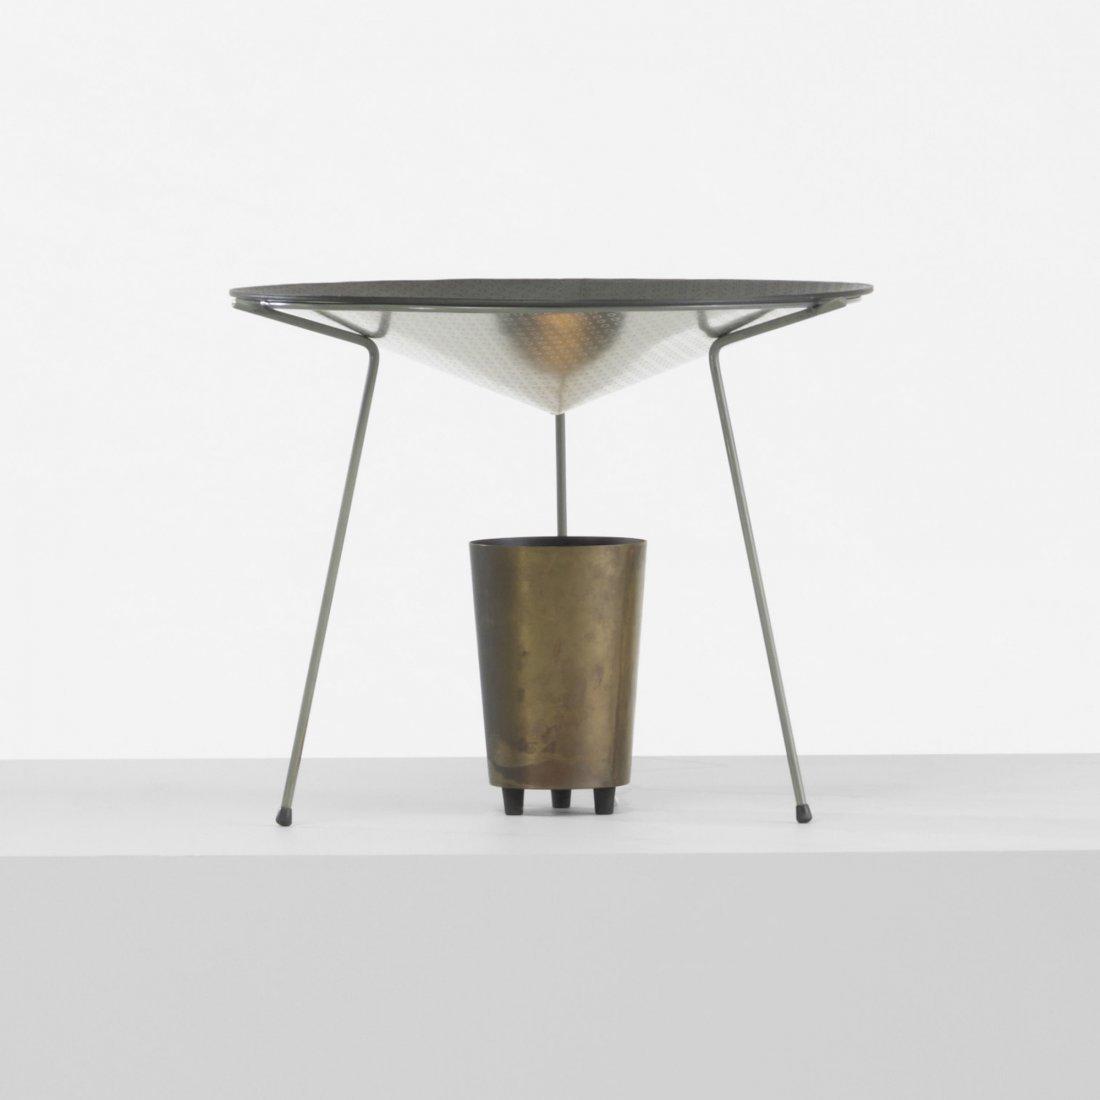 109: Joseph Burnett table lamp, model T-1-B